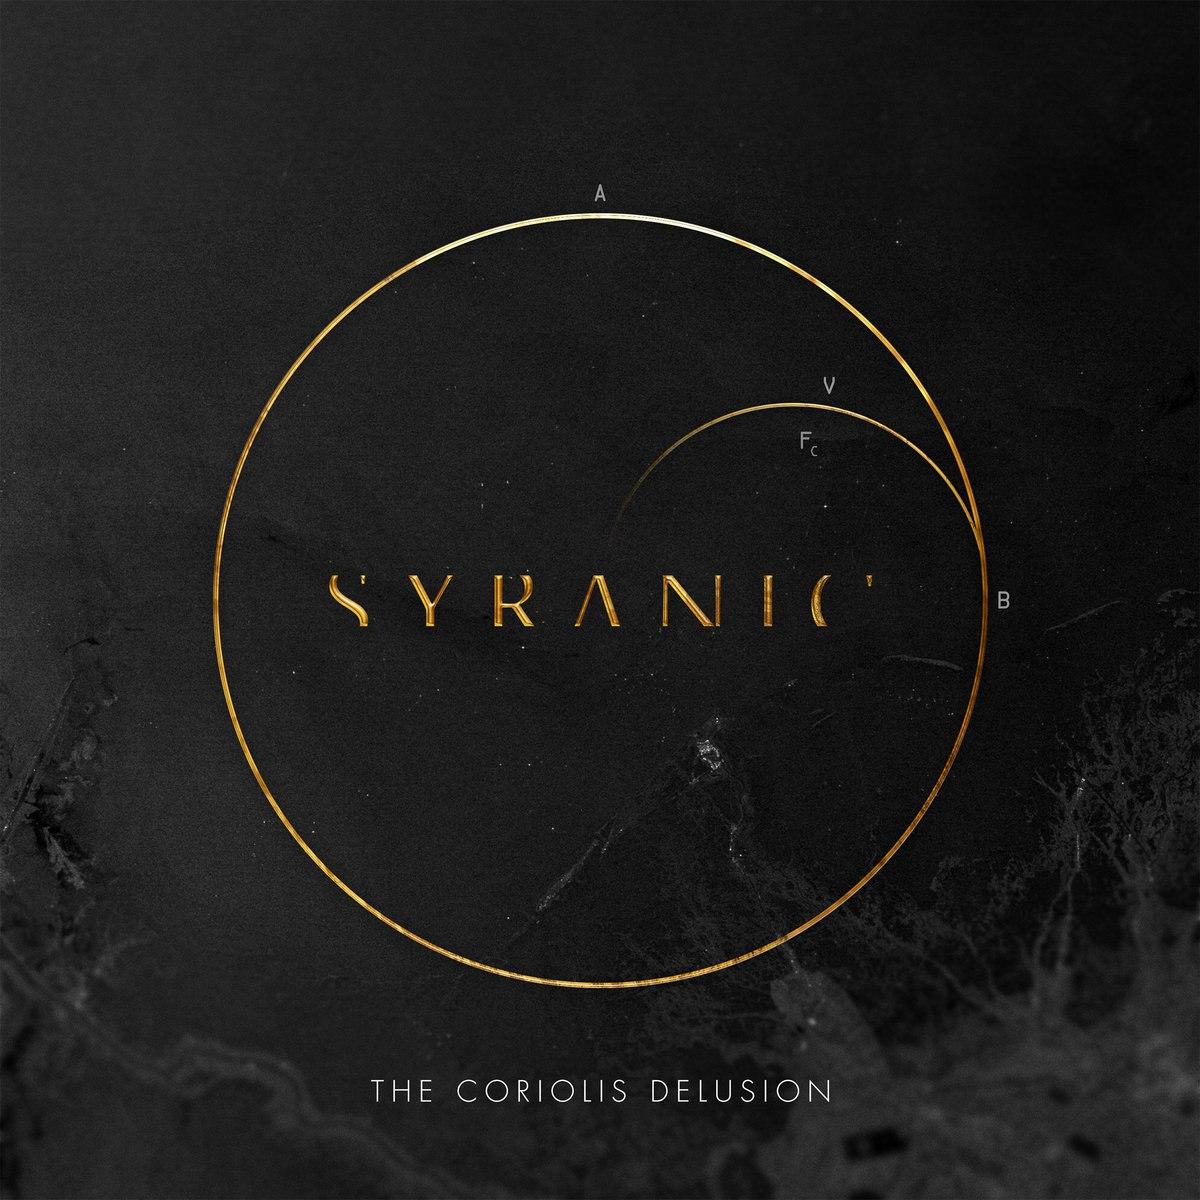 Syranic - The Coriolis Delusion [EP] (2015)